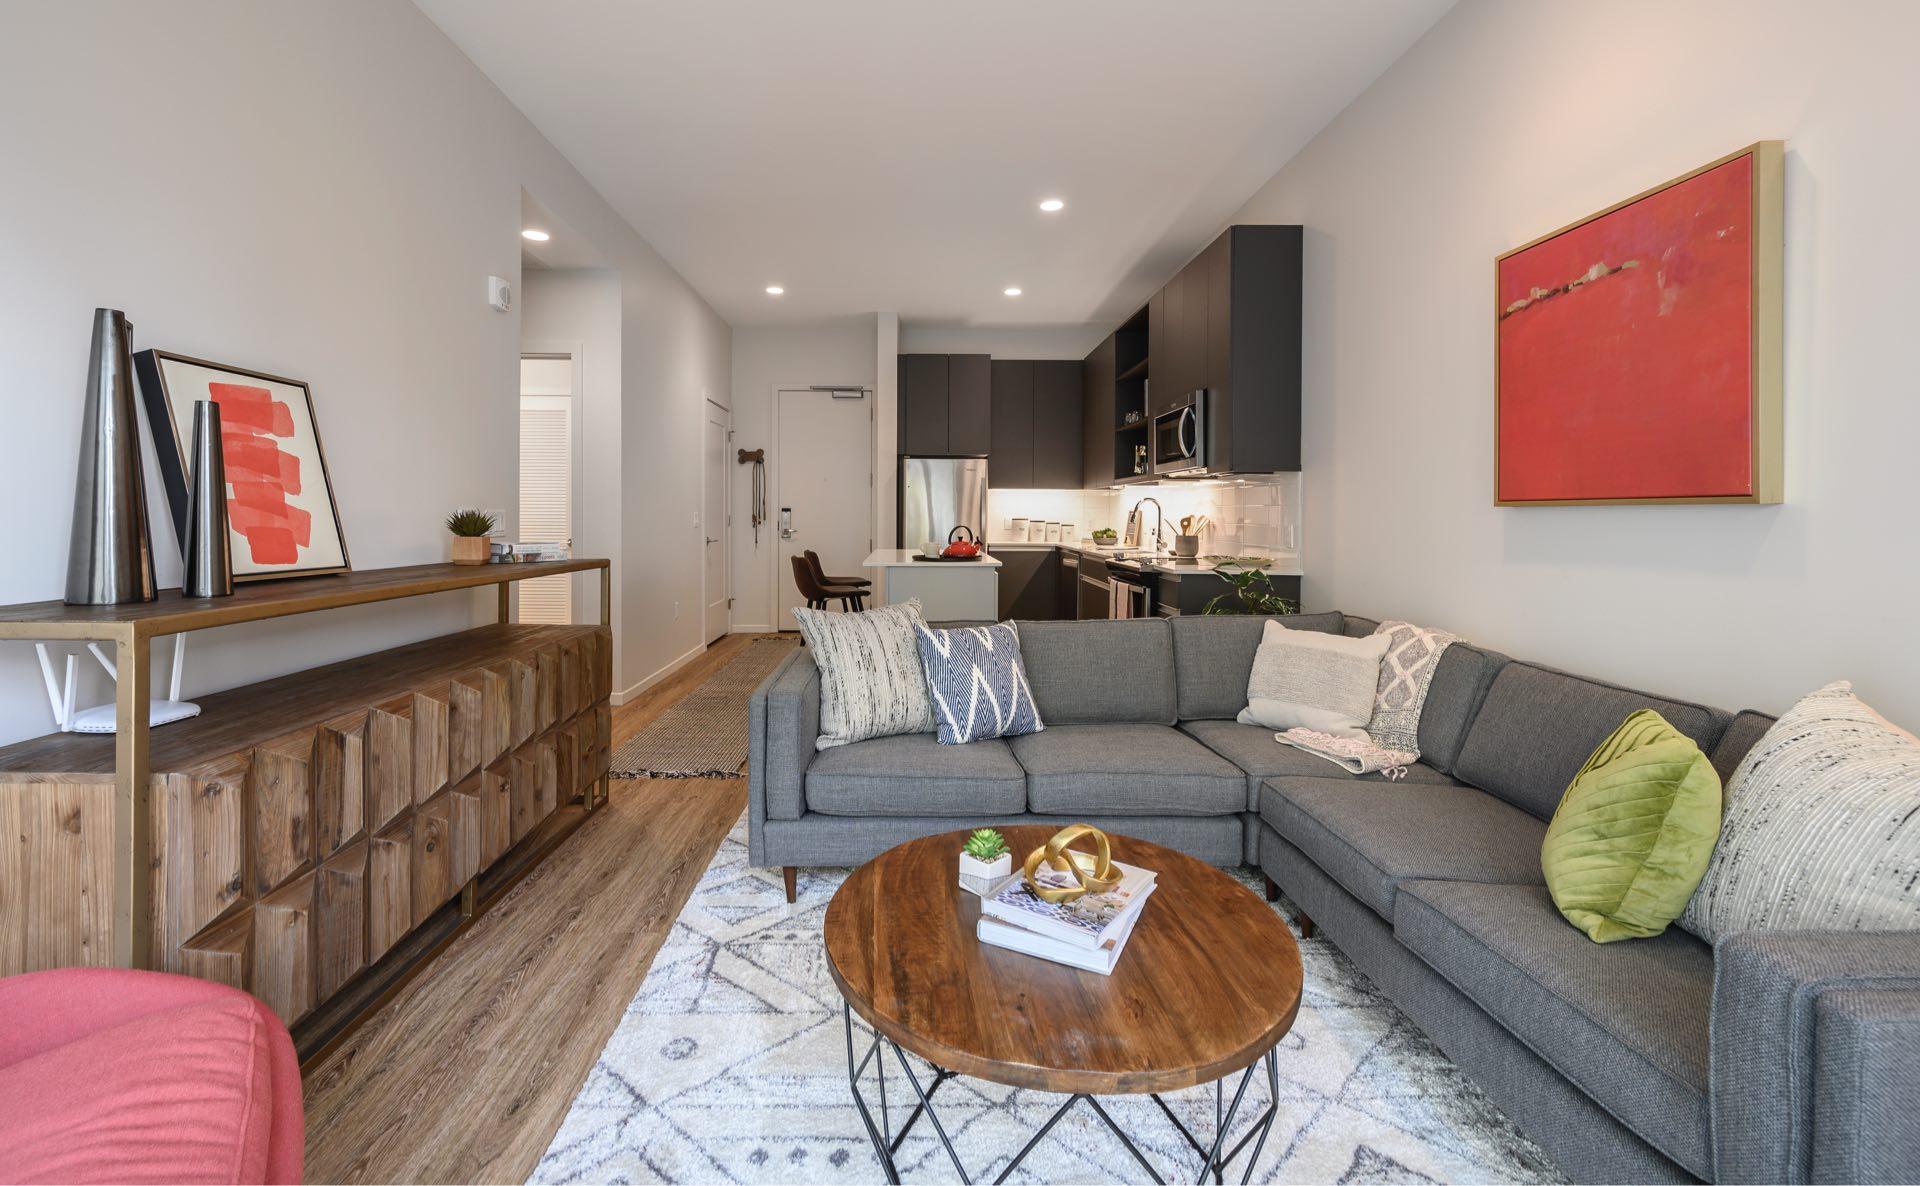 Apartments img 8